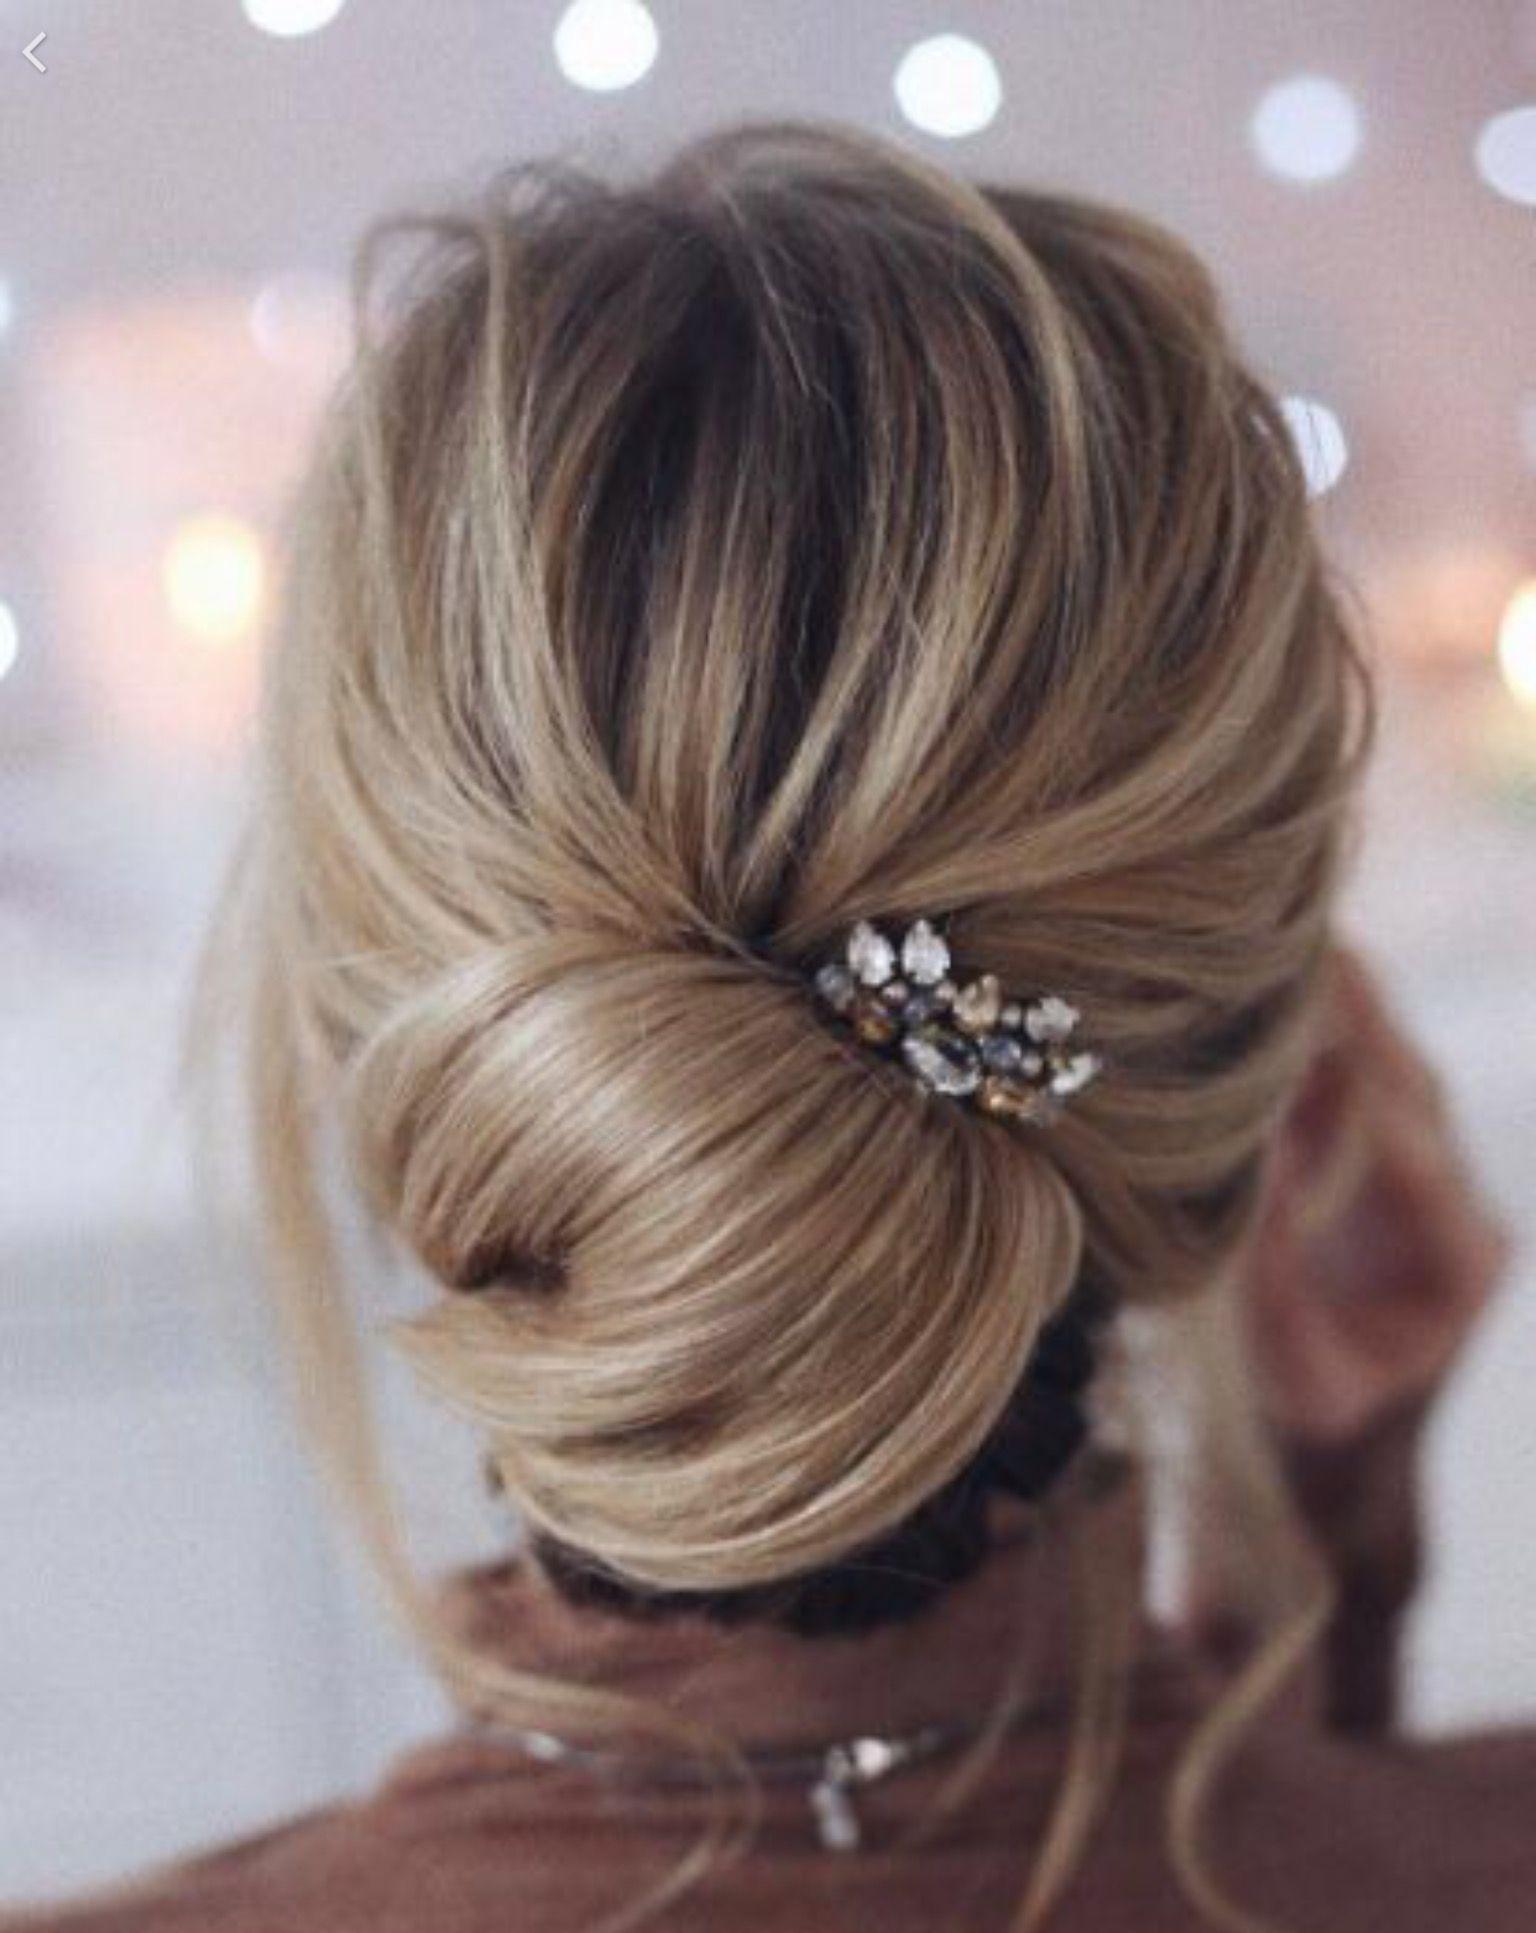 Pin by dolo bero on peinados pinterest hair tricks updos and